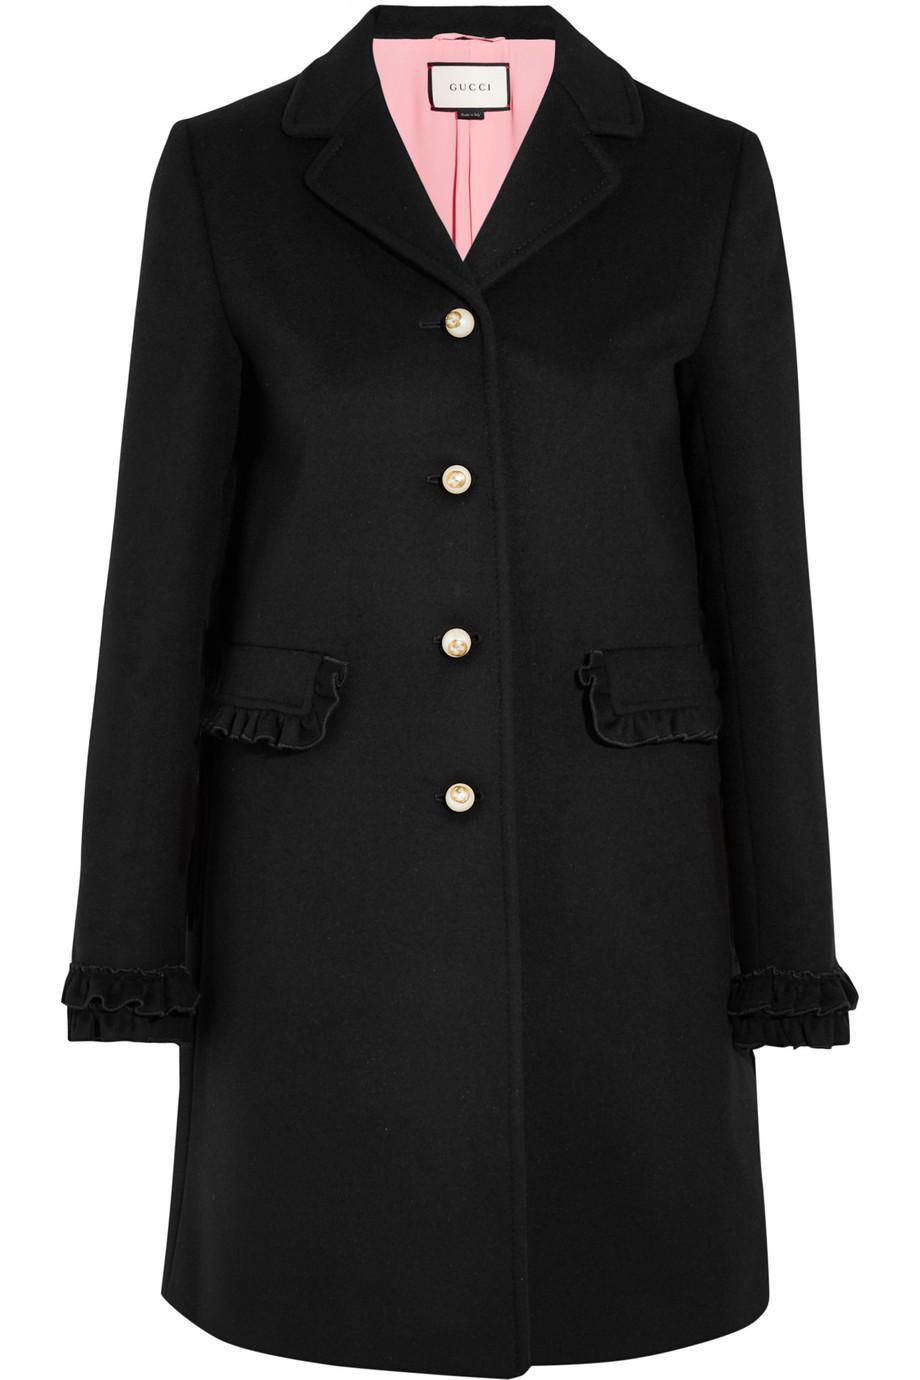 Gucci Ruffle-Trimmed Wool Coat, Black, Women's, Size: 38